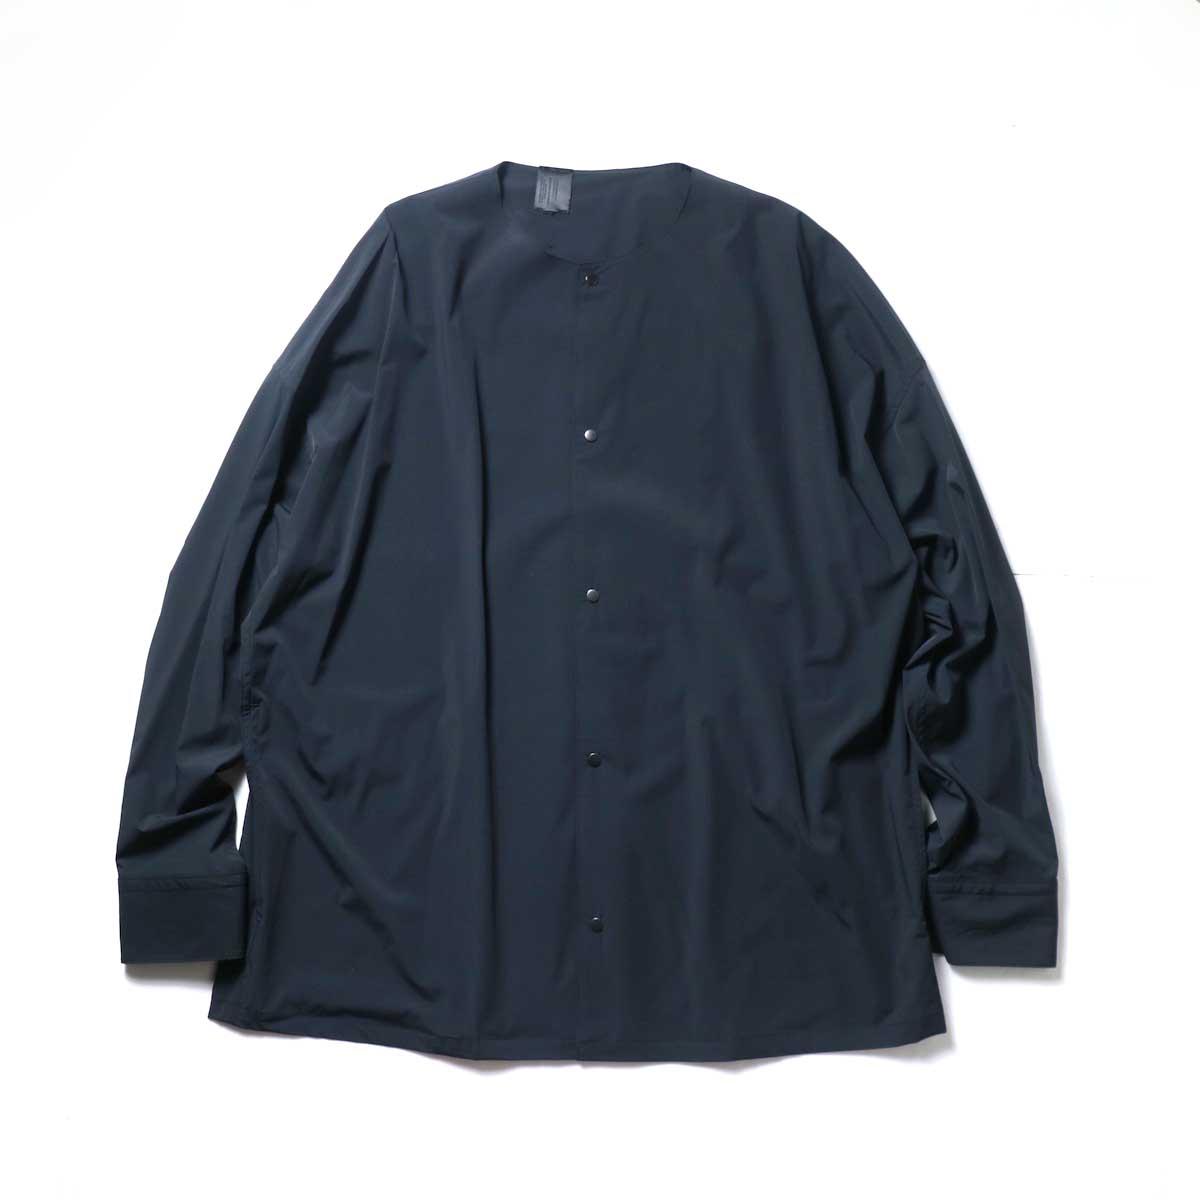 N.HOOLYWOOD / 2211-SH25-006 peg Collarless Shirt (Black)